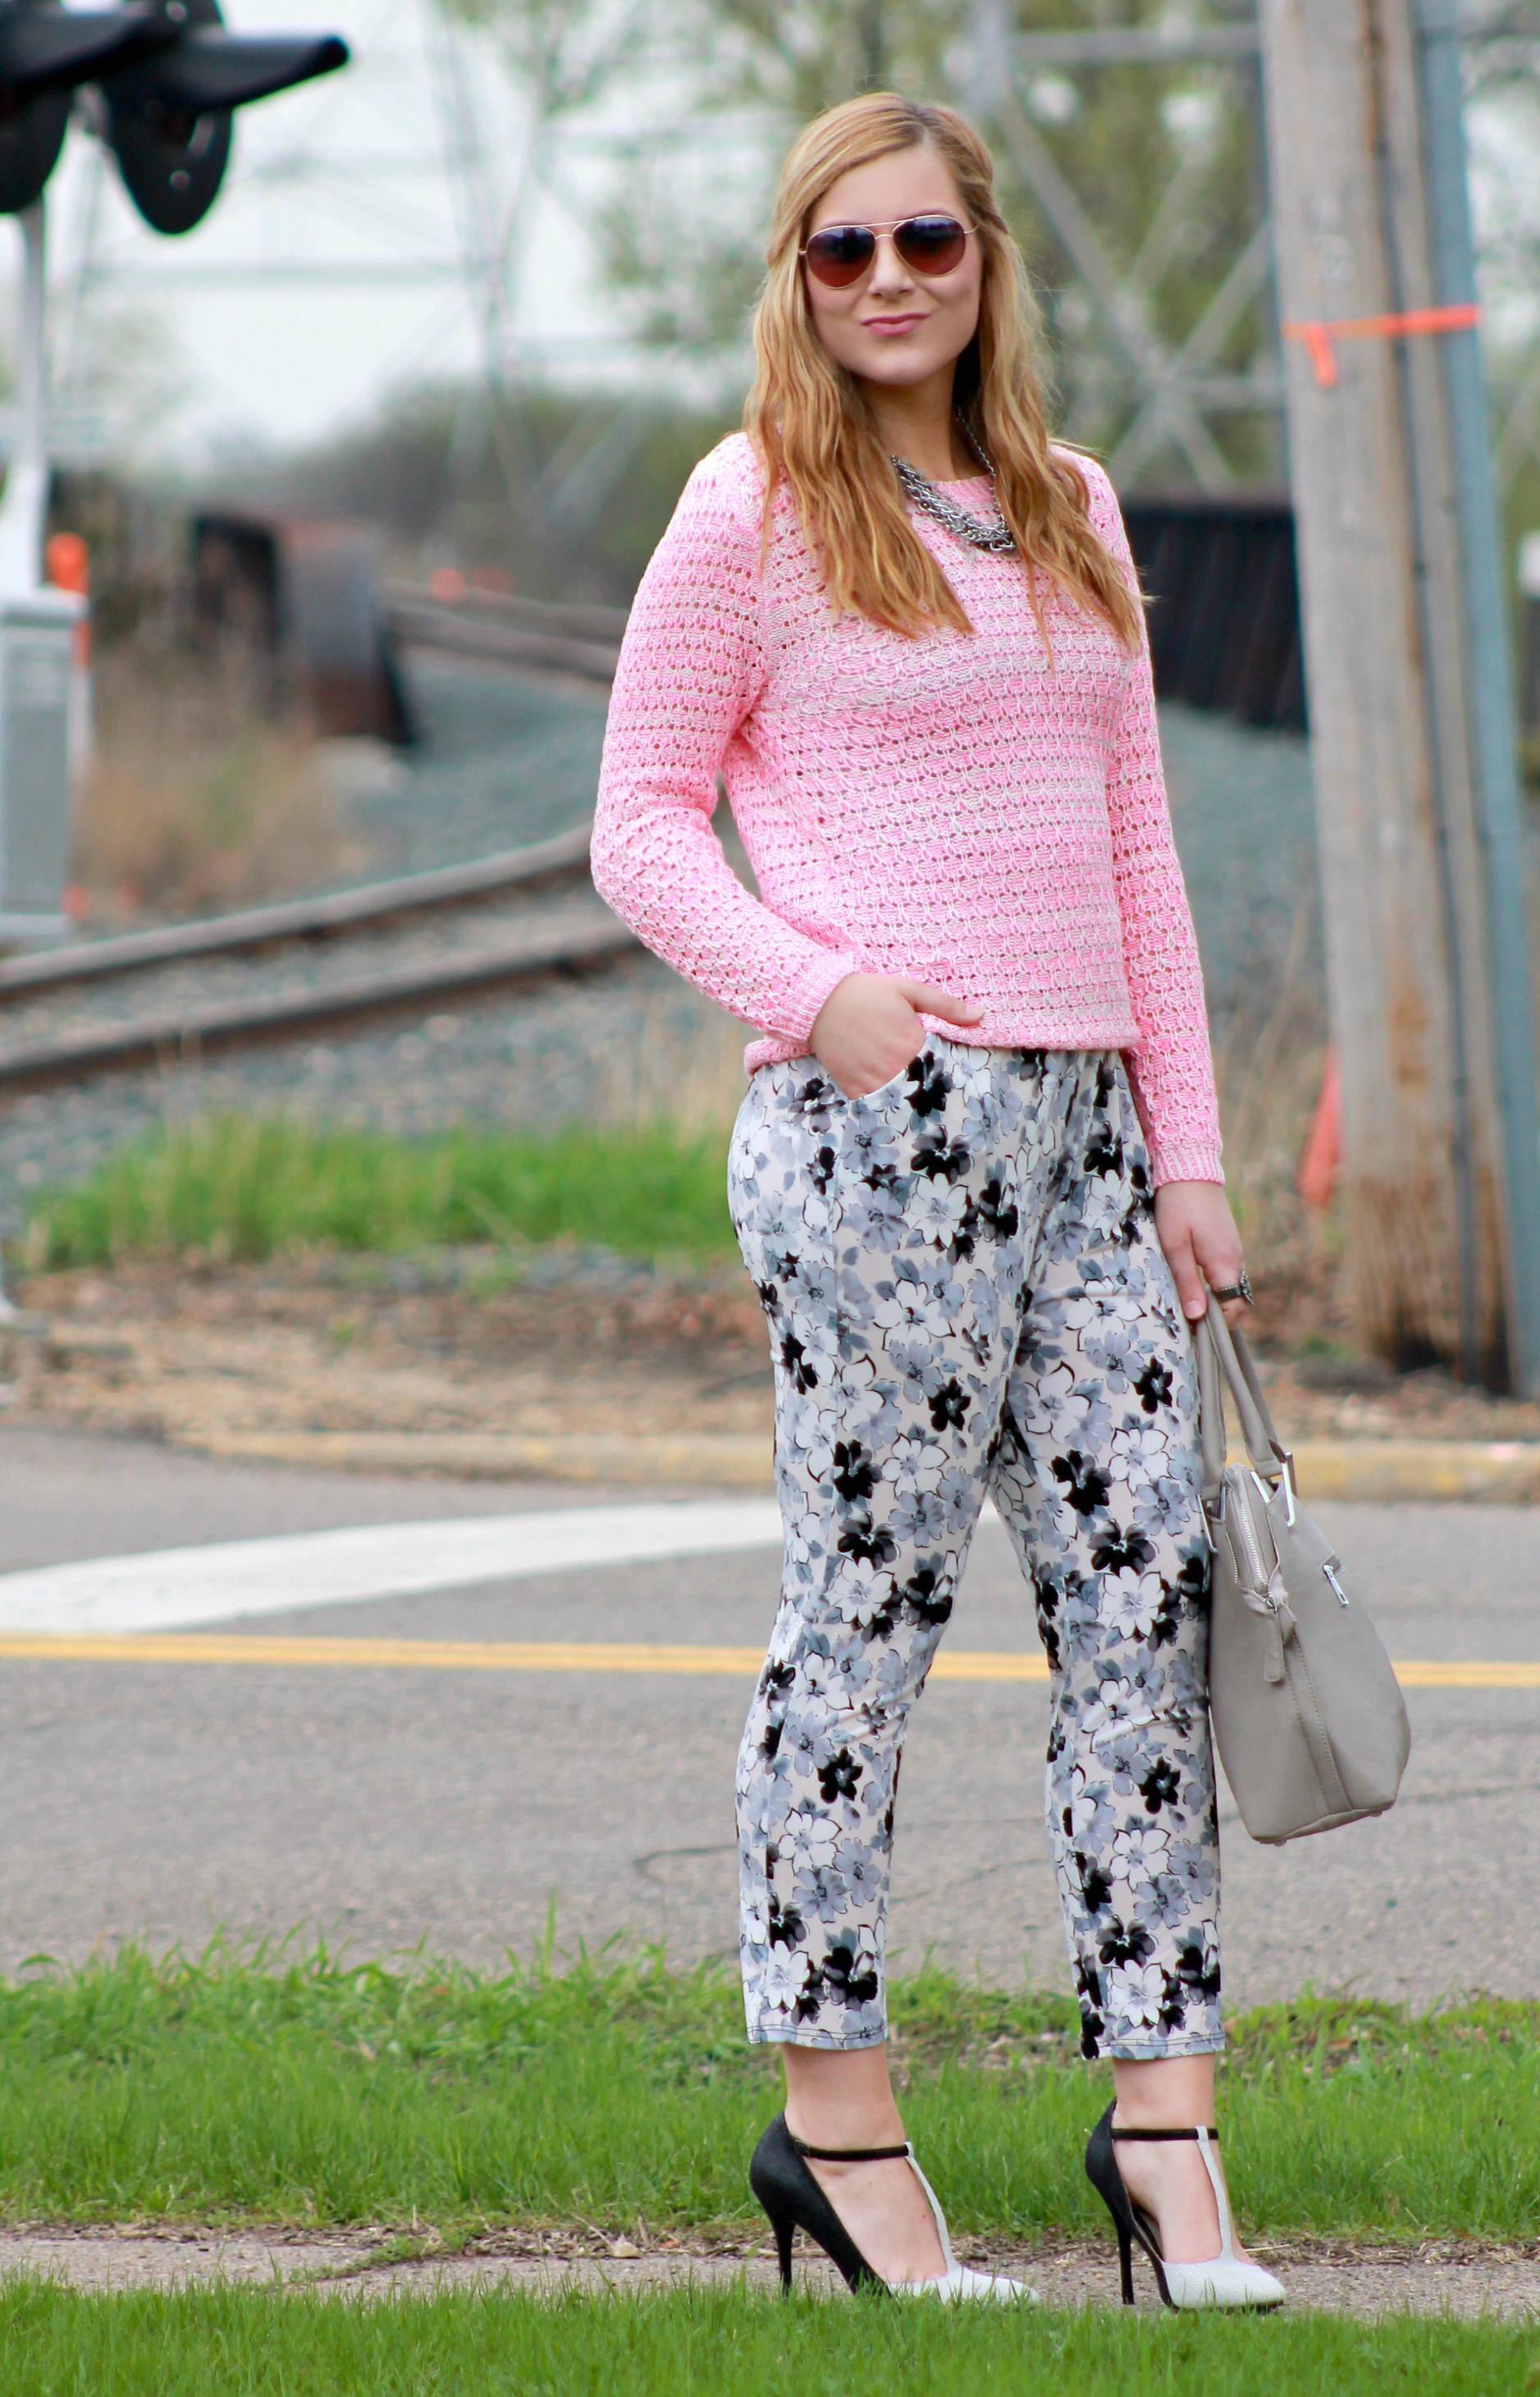 Pink Neon Sweater + T-Strap Heels